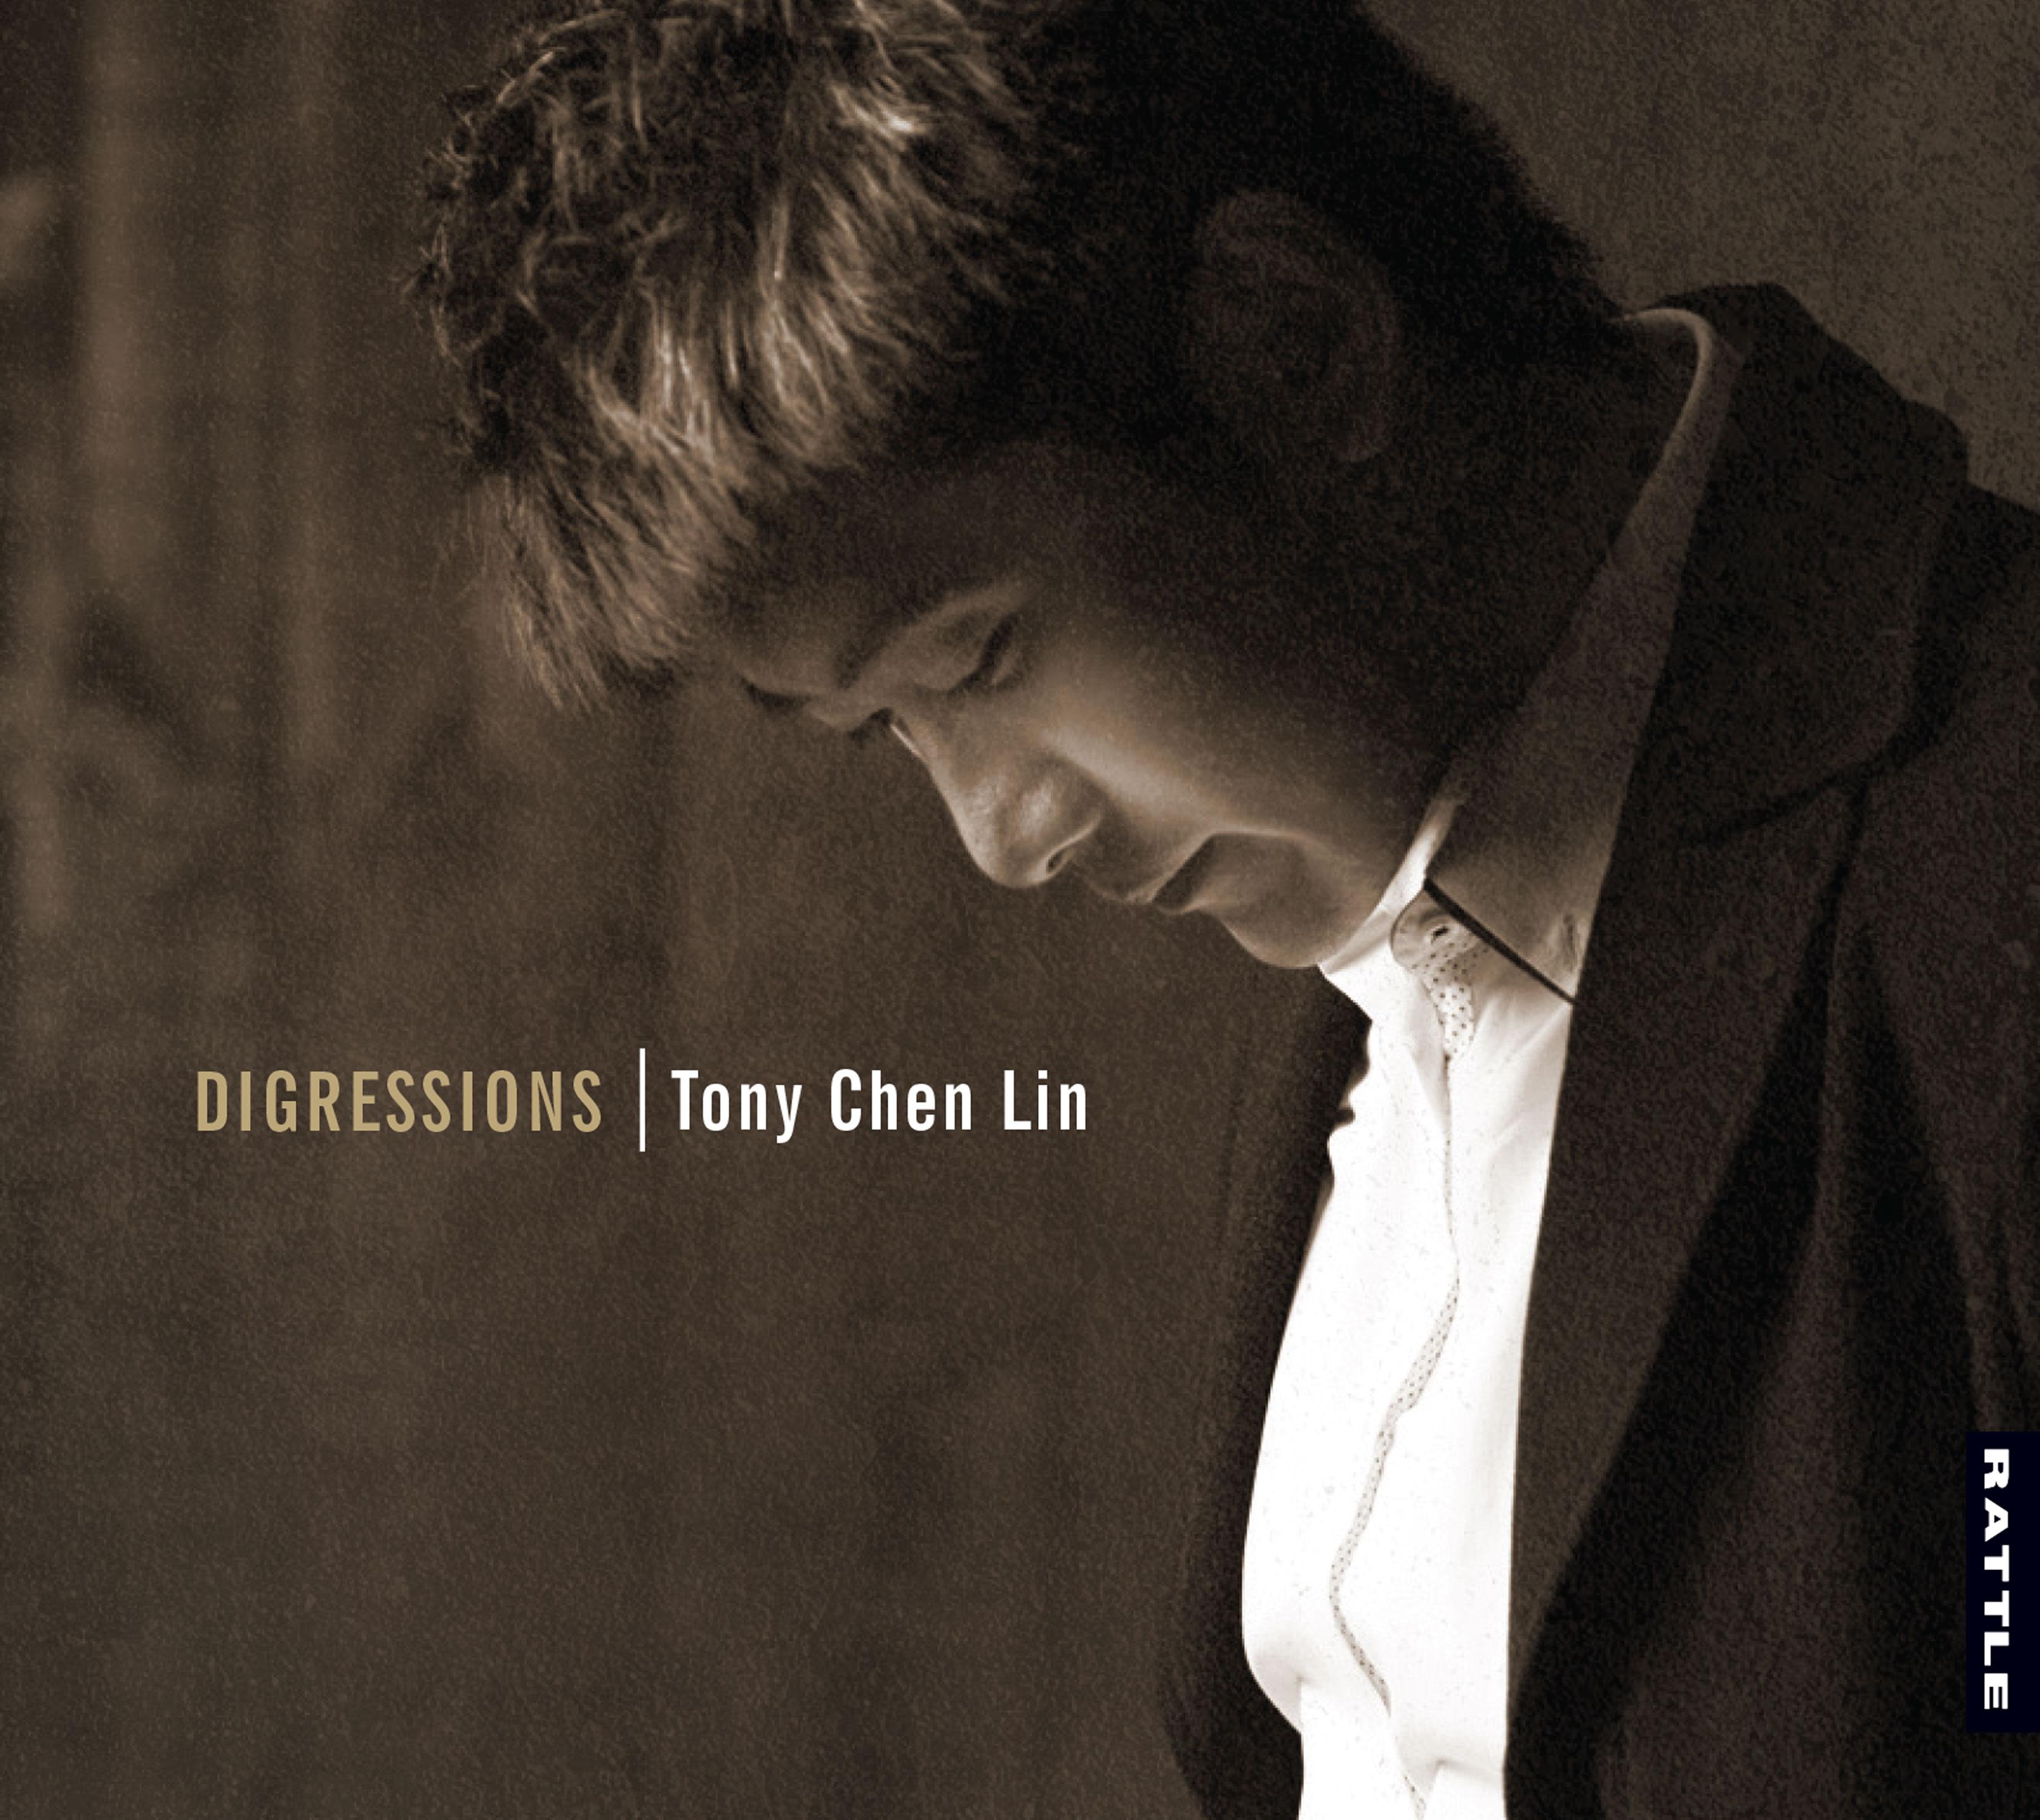 Tony Chen Lin   Digressions - downloadable MP3 ALBUM